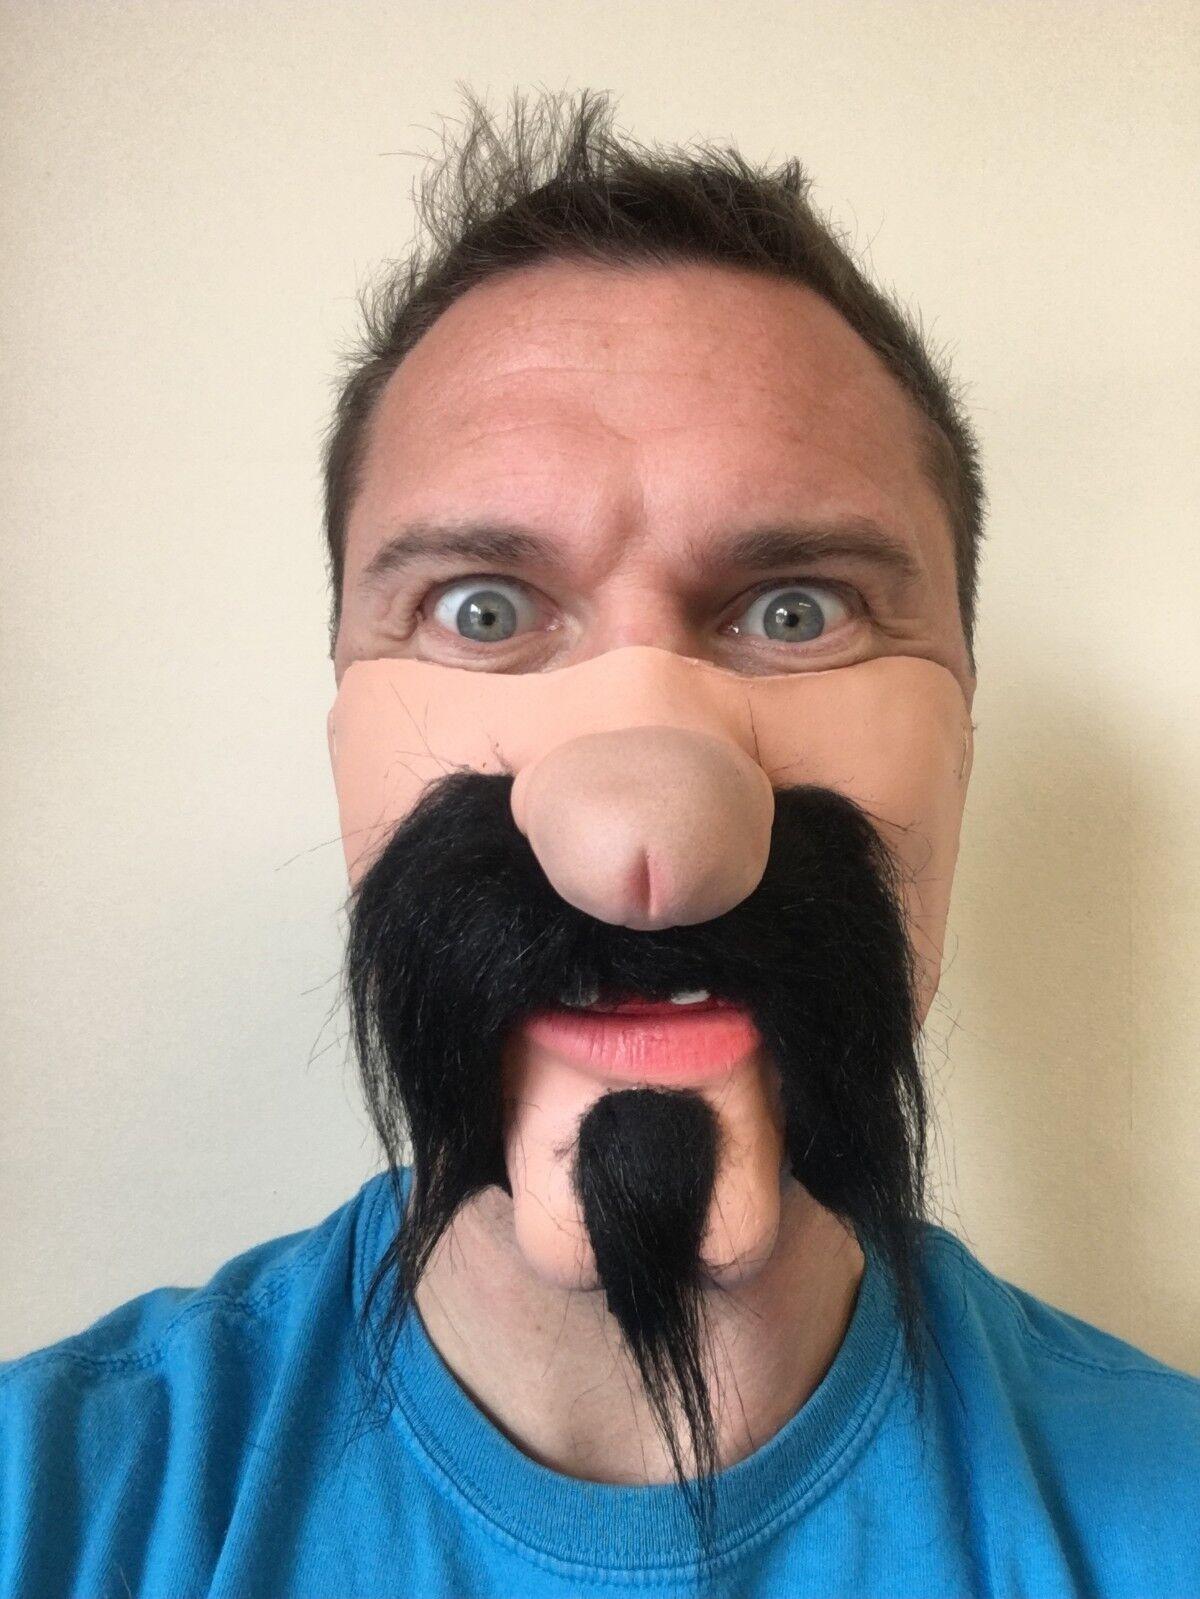 Divertente Mezzo Viso Dick Naso Maschera Messicano Gringo Baffi Neri Willy maschere Stag